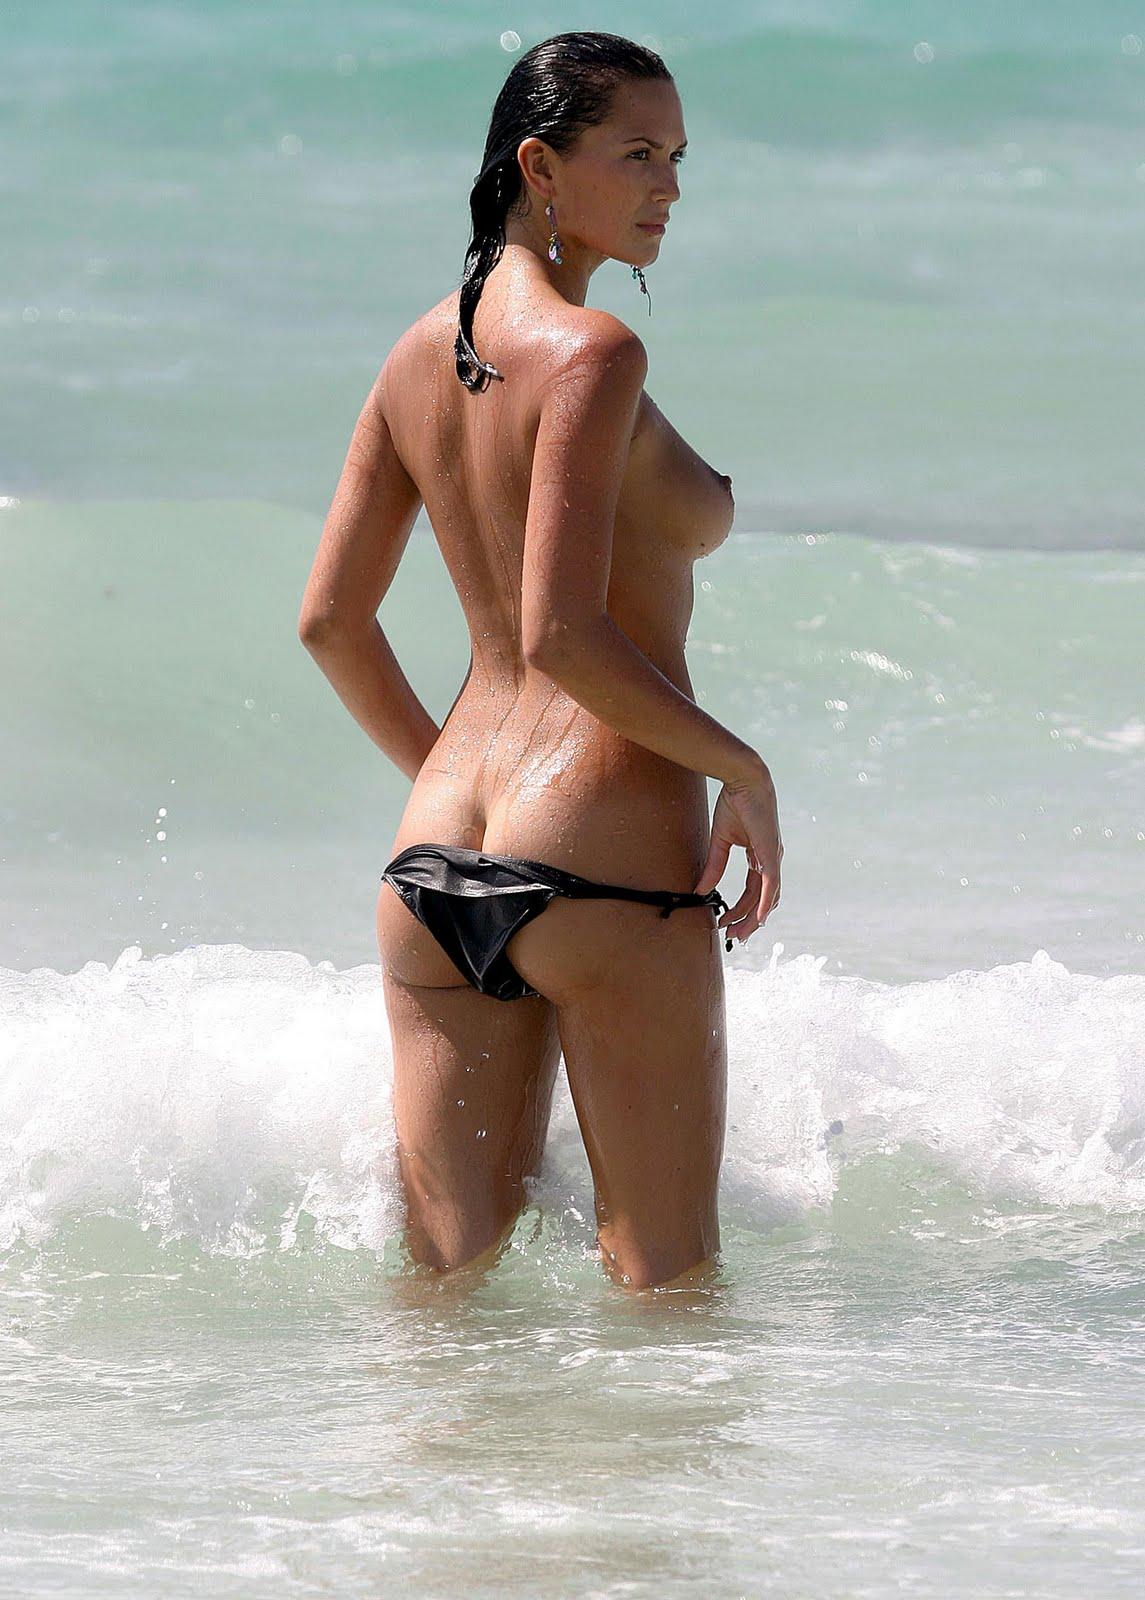 Lara croft naket picture porno pic